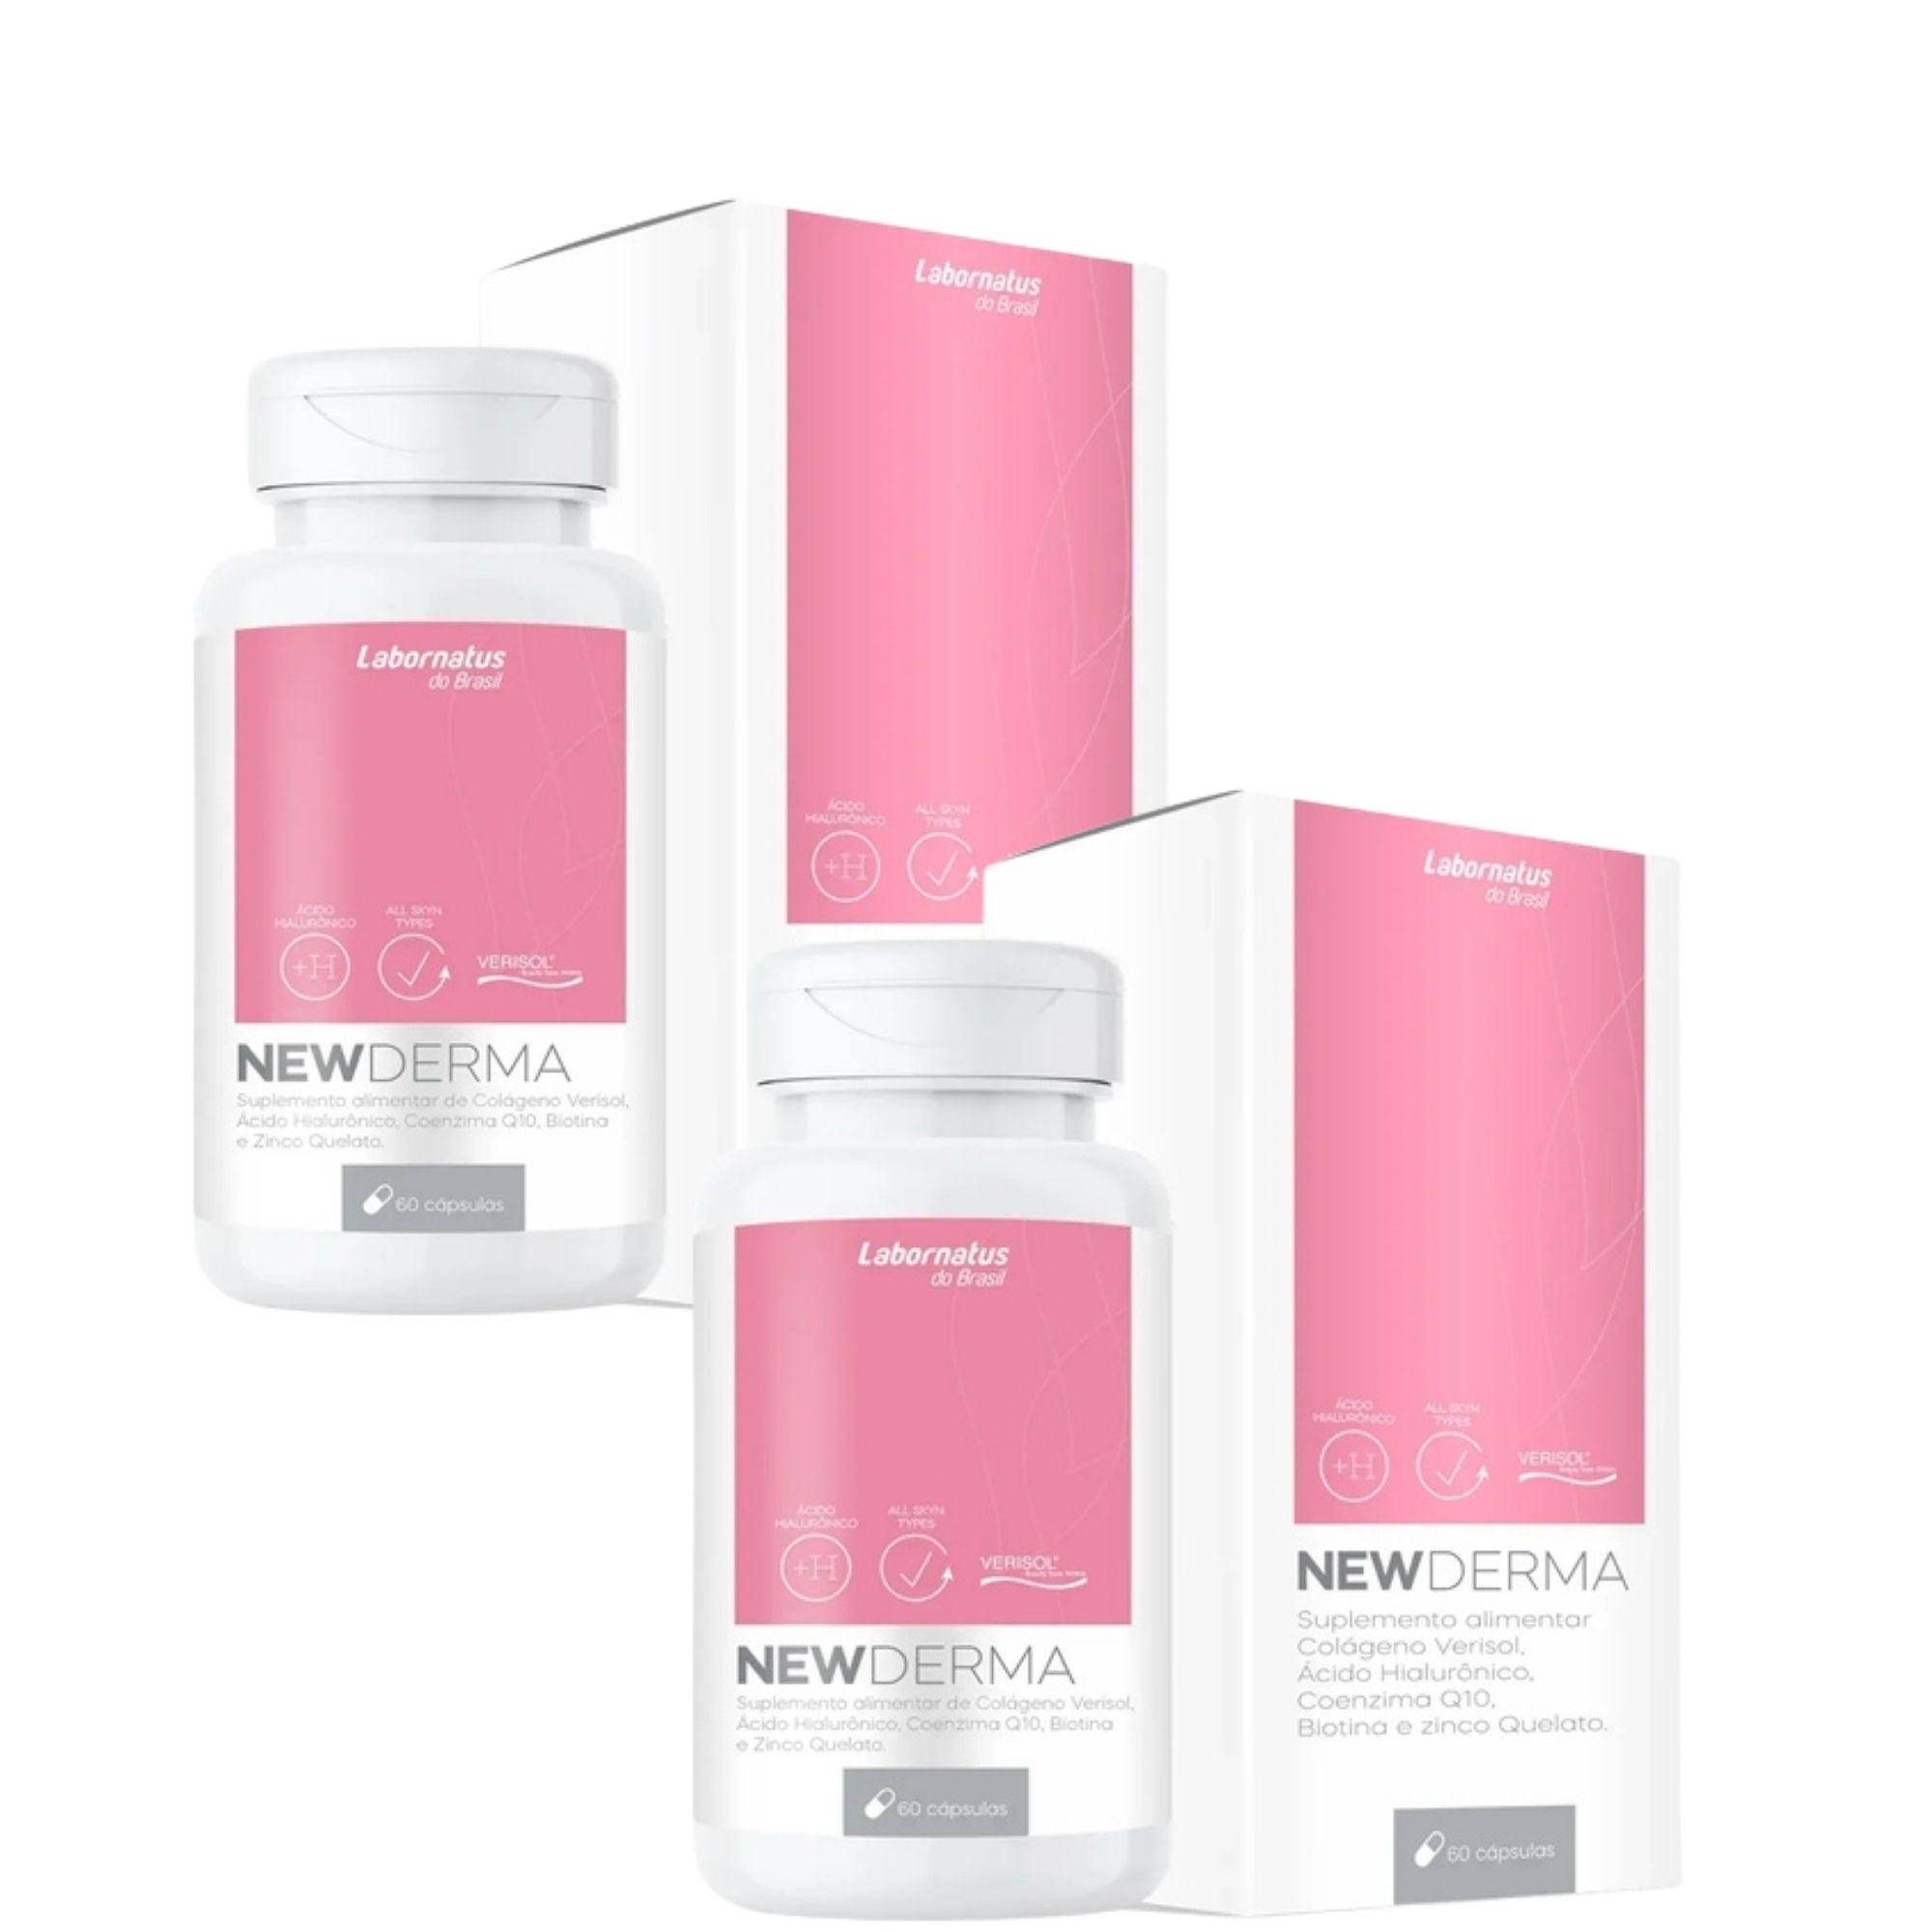 LB - Combo NEW DERMA (Colágeno Verisol Biotina Ácido Hialurônico ) 120CAPS 500mg